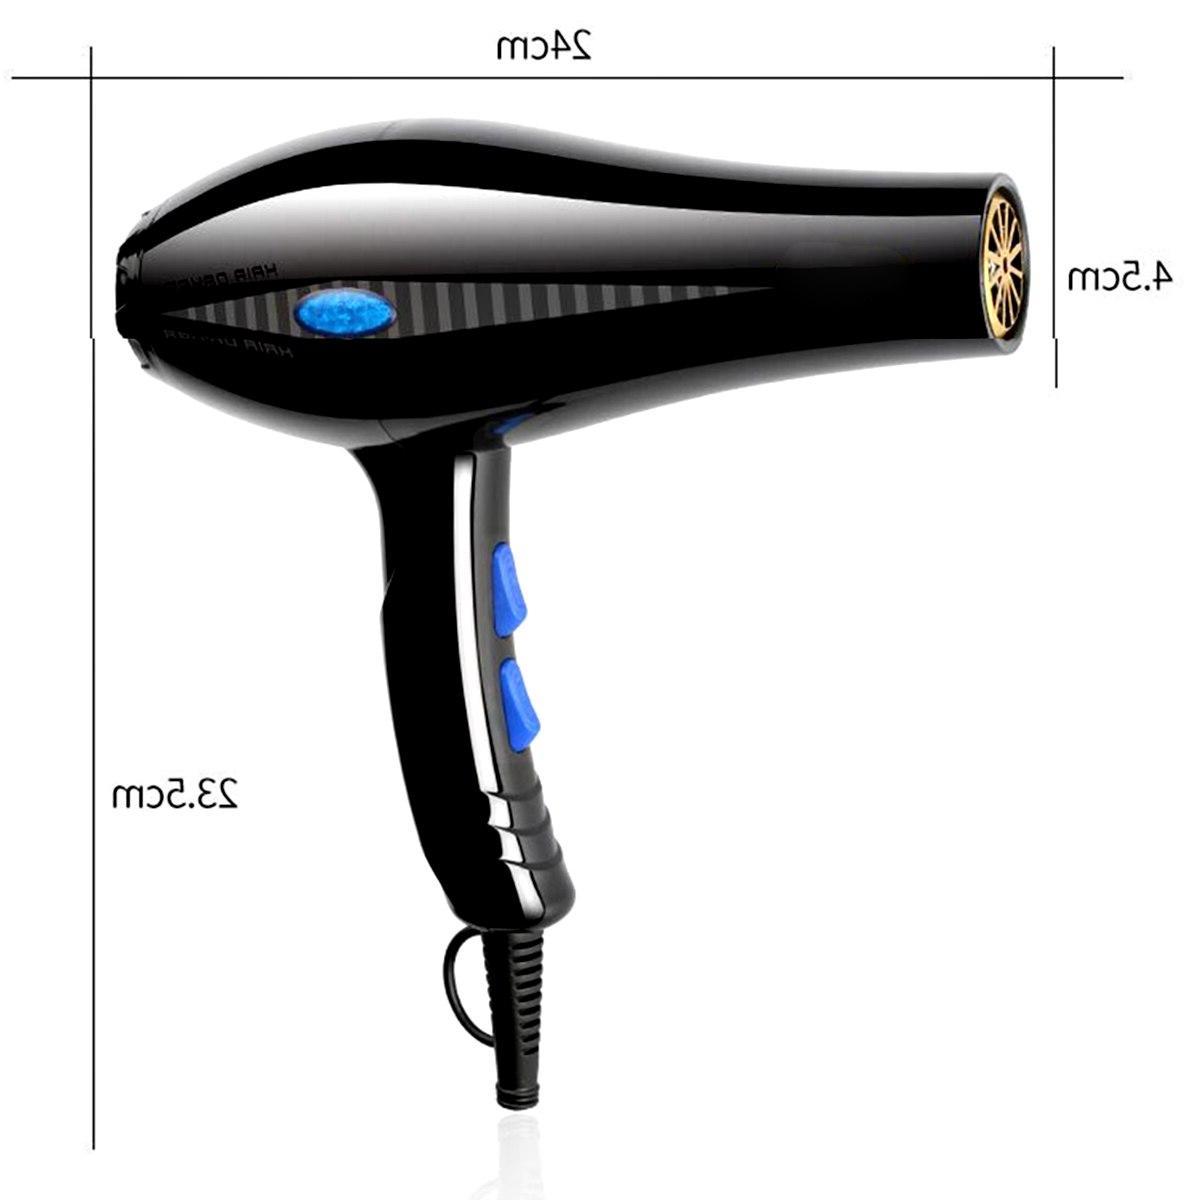 AUGIENB Hair <font><b>Dryer</b></font> Hot <font><b>Ionic</b></font> Heating Household Hairdressing Salon